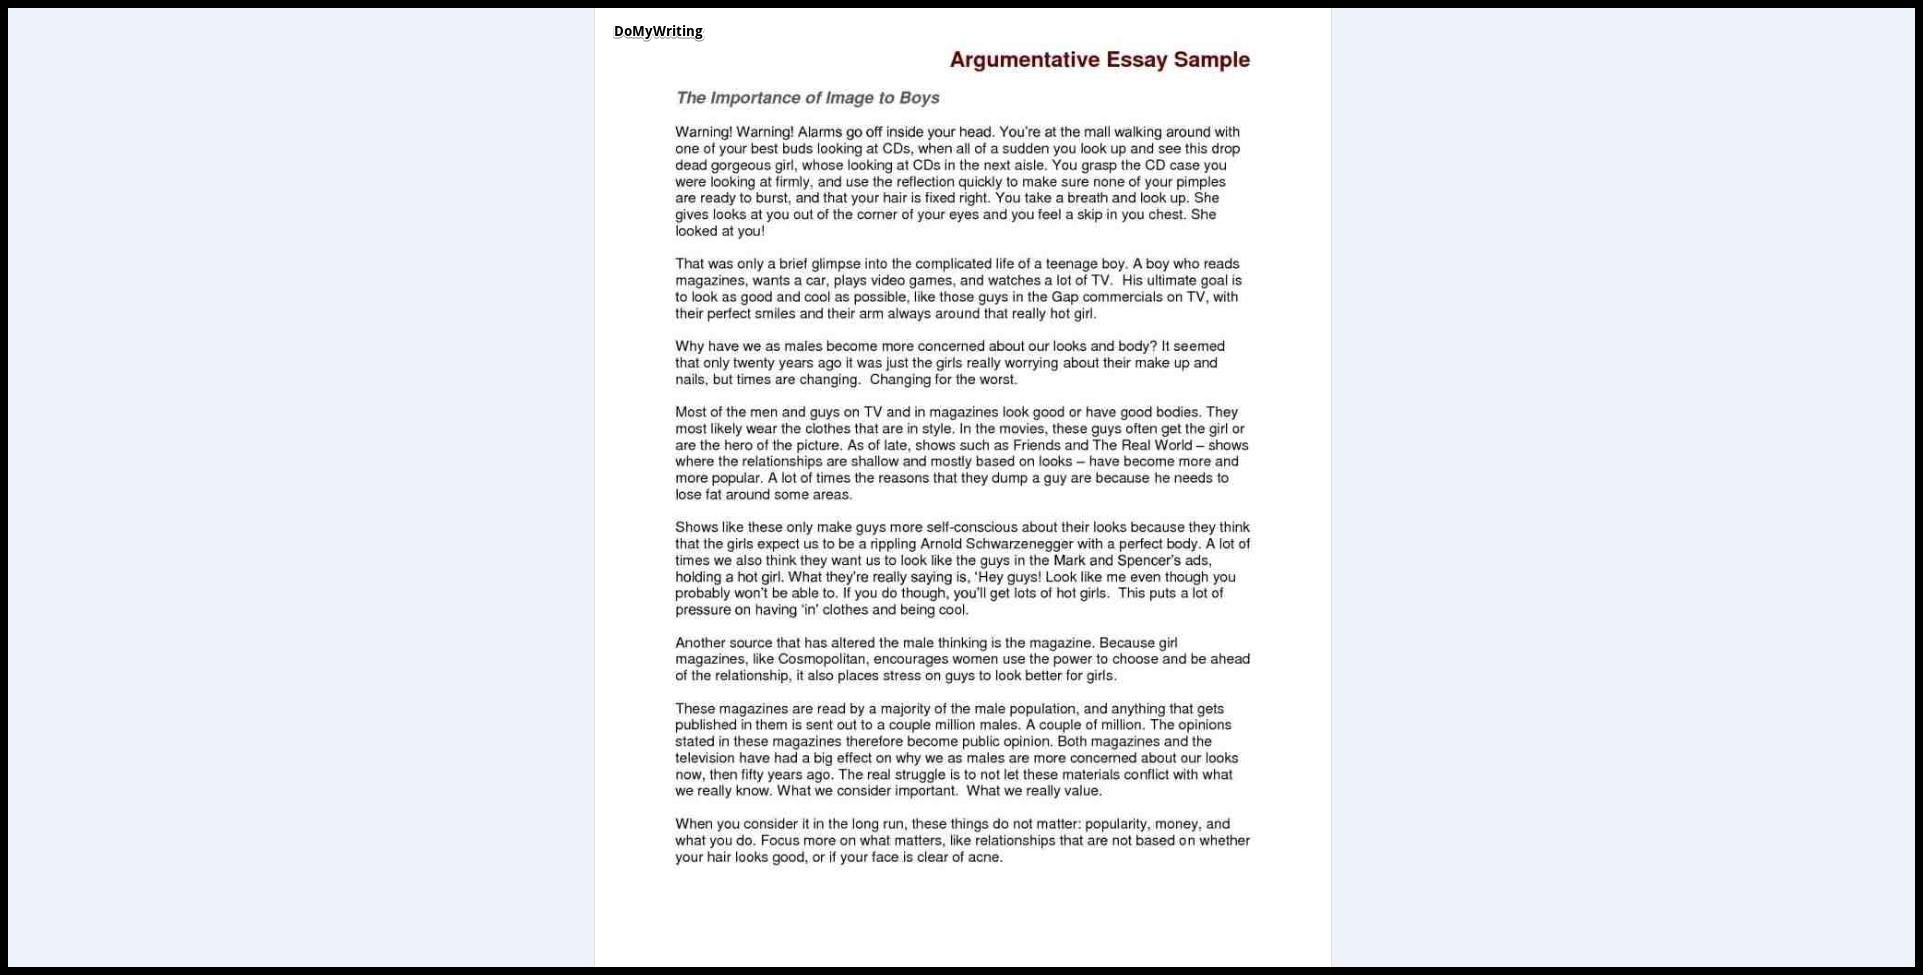 002 Argumentative Essay Sample Example Fascinating Best Topics Uk 2018 Full